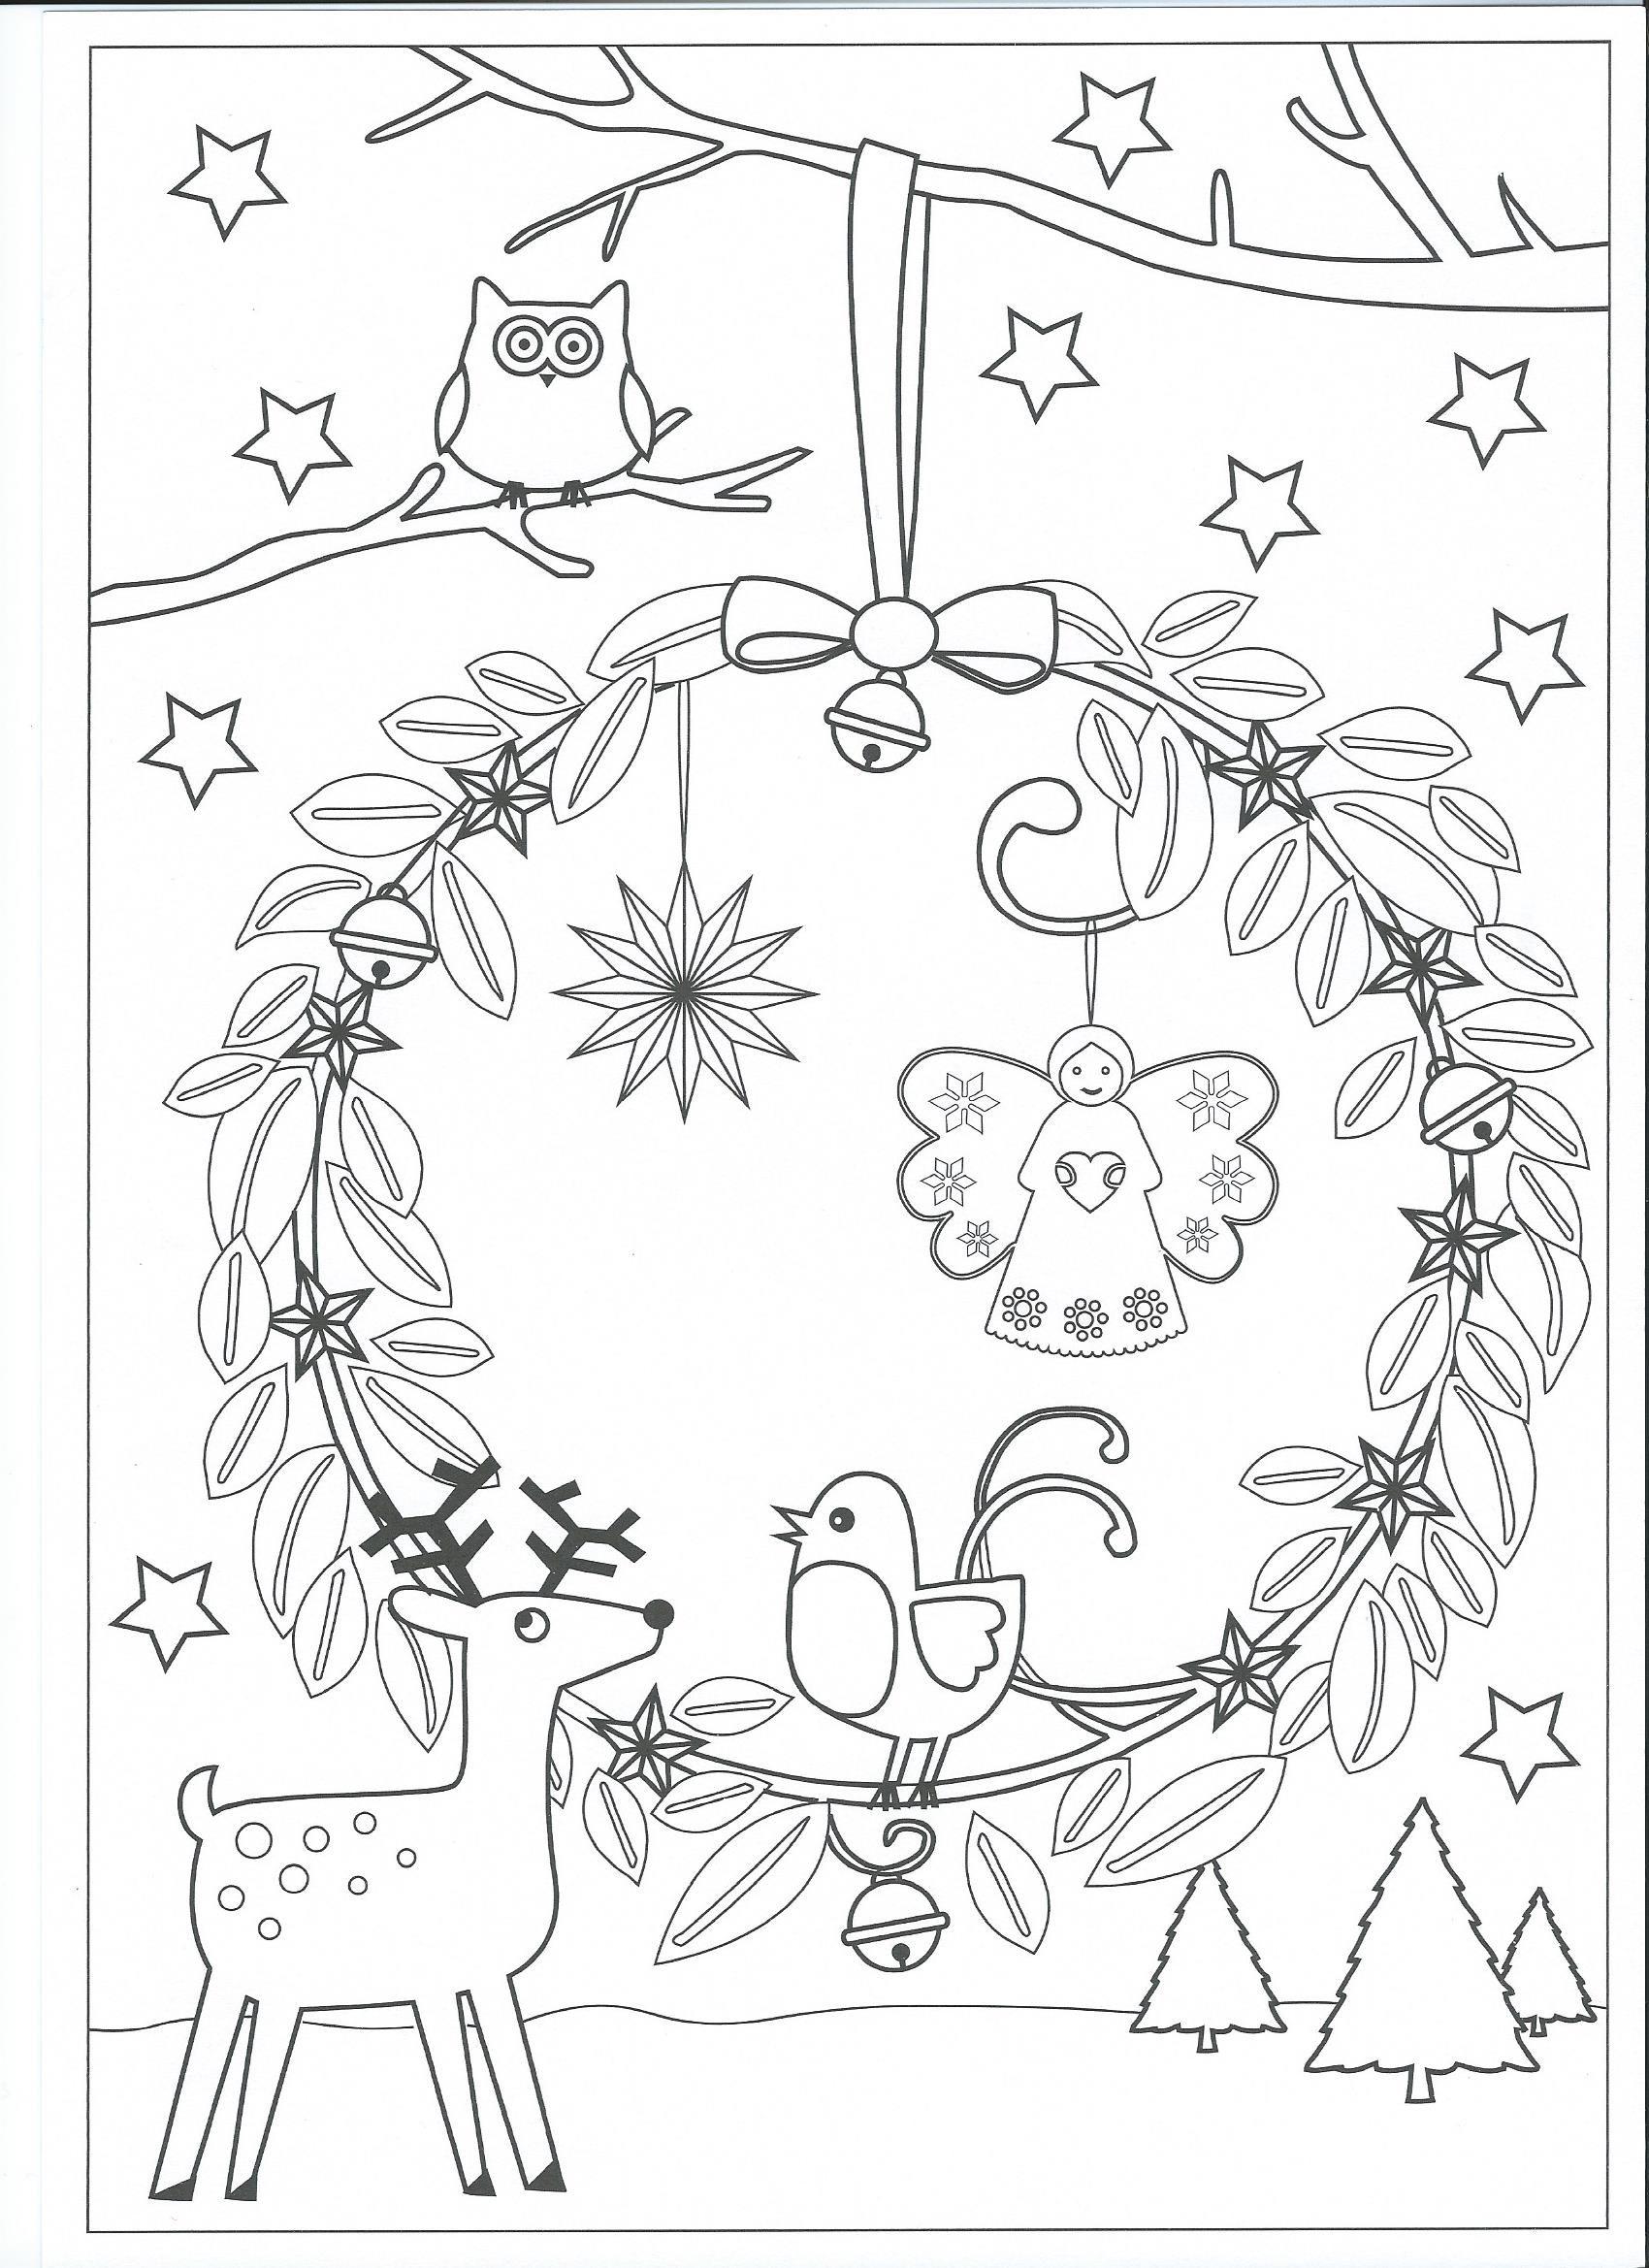 dikkie dik kleurplaat kerst kidkleurplaat nl